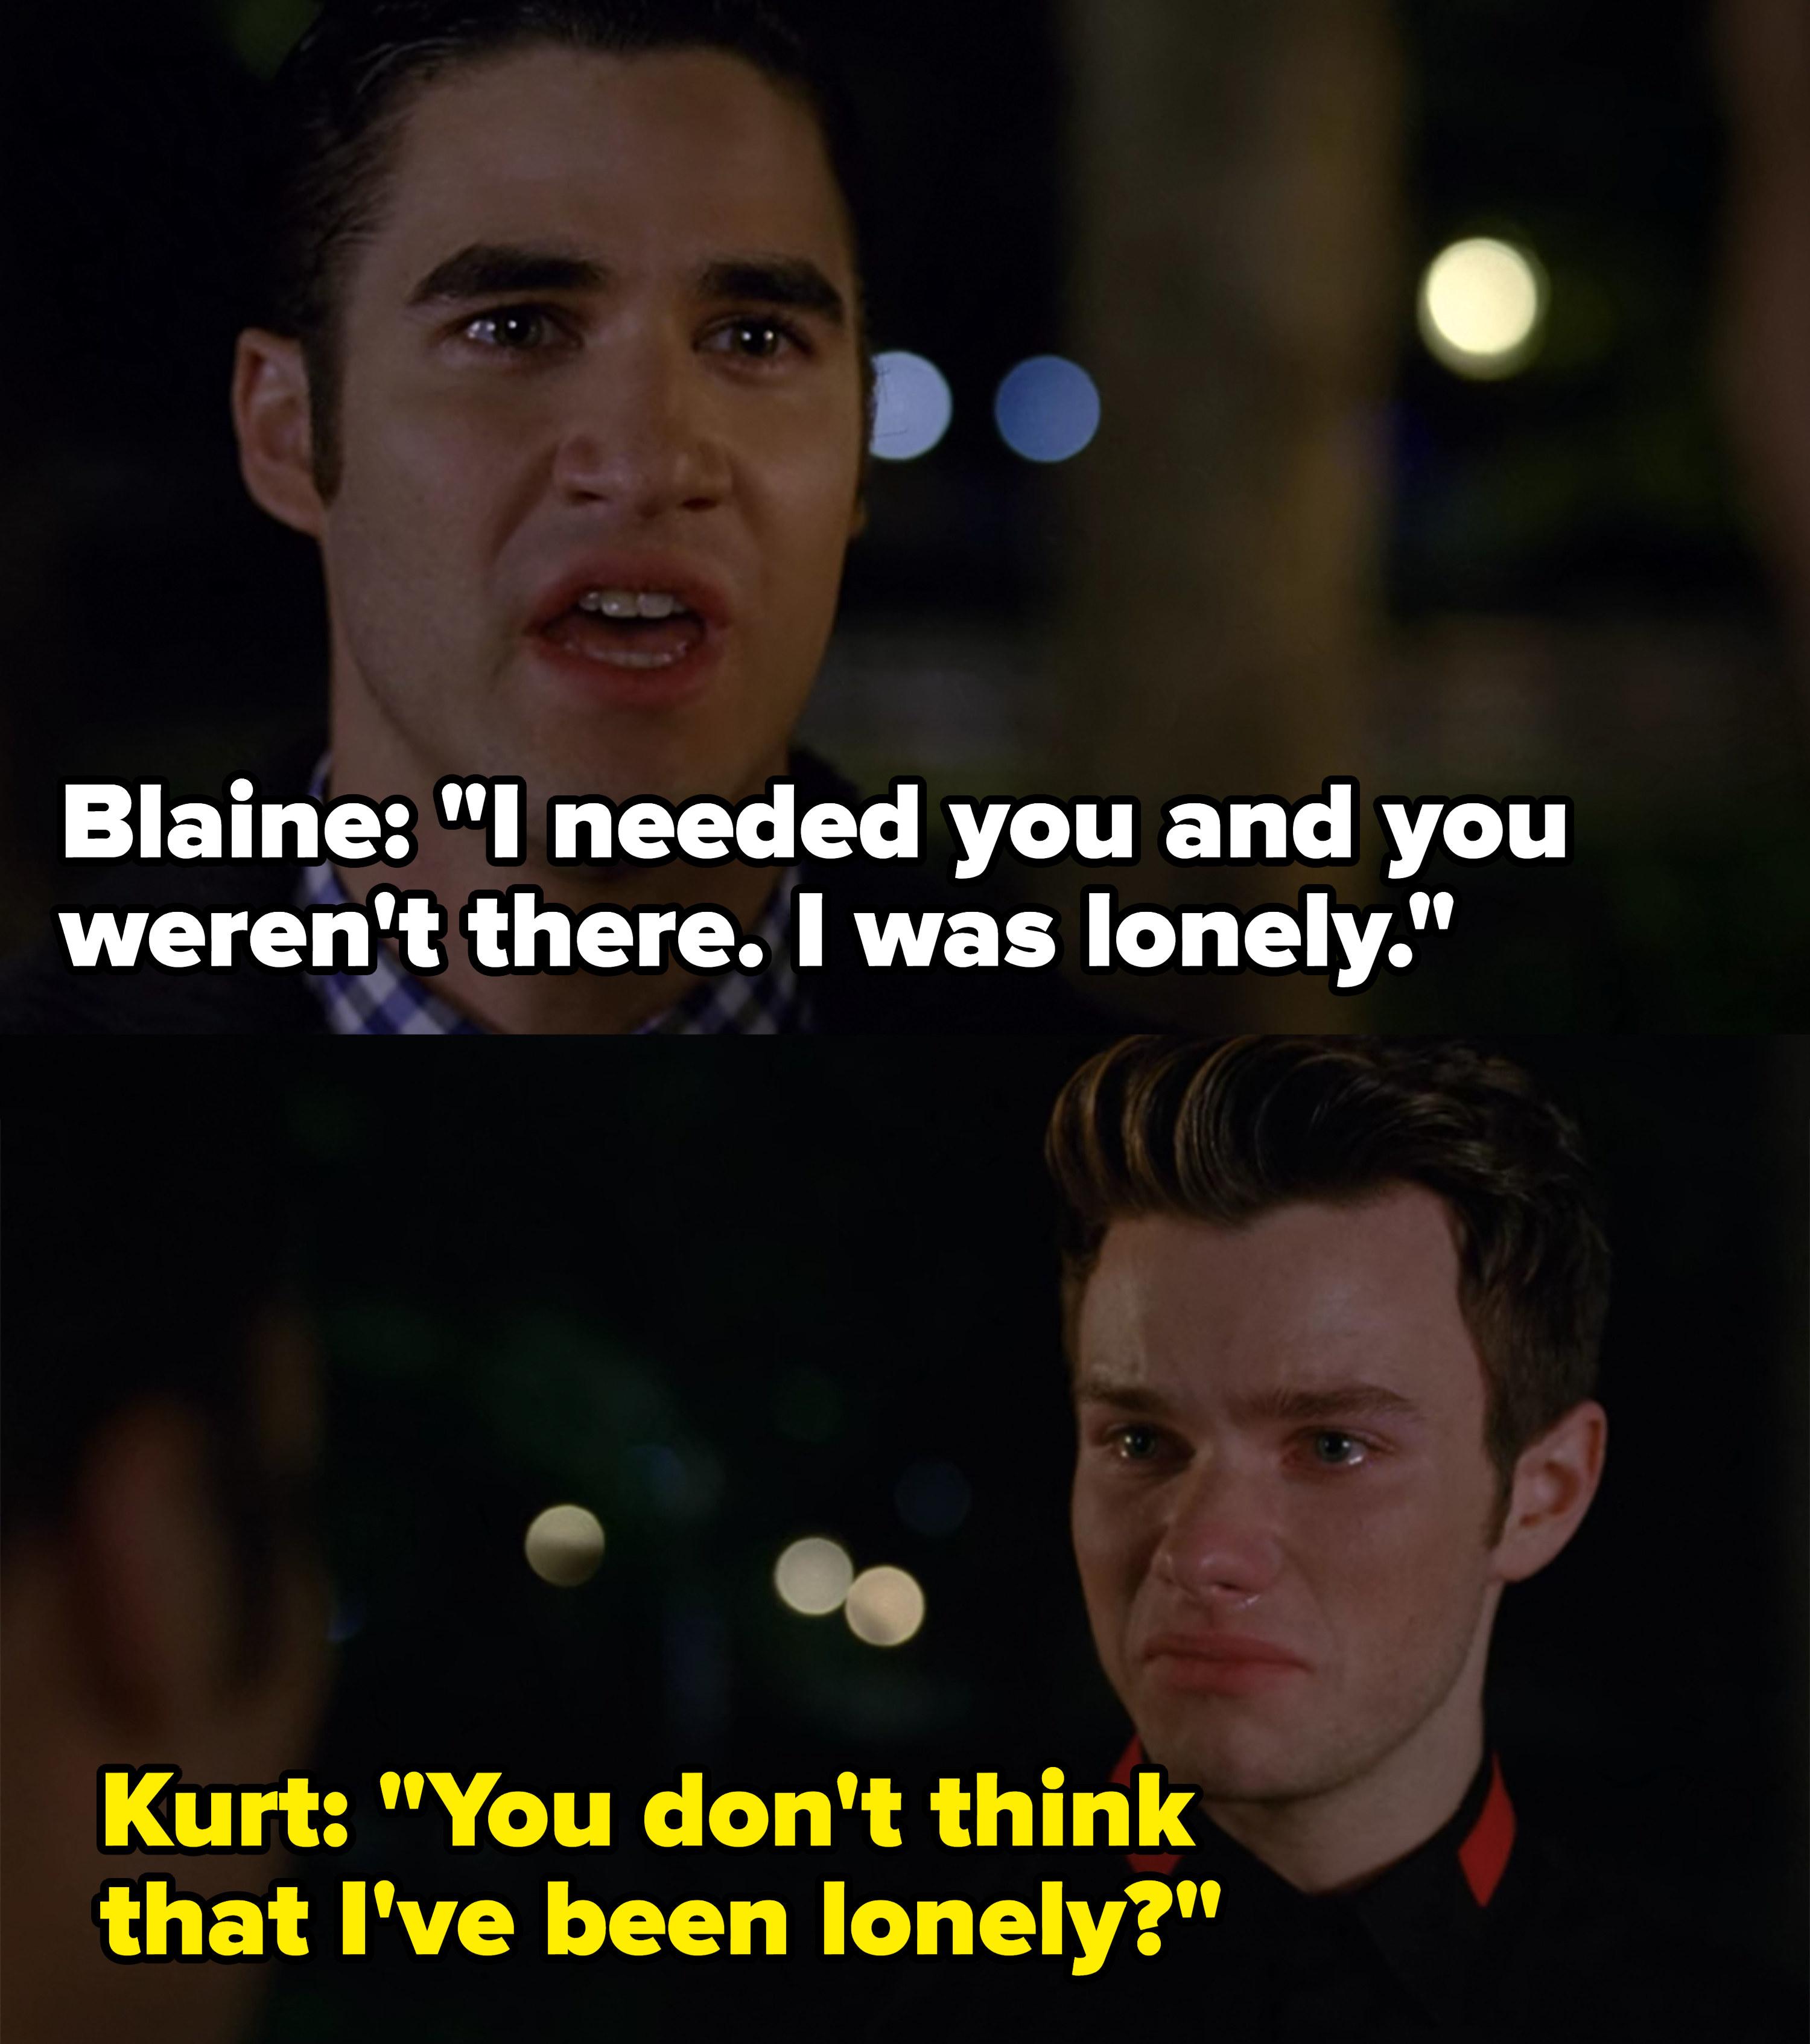 Blaine tells Kurt he cheated on him